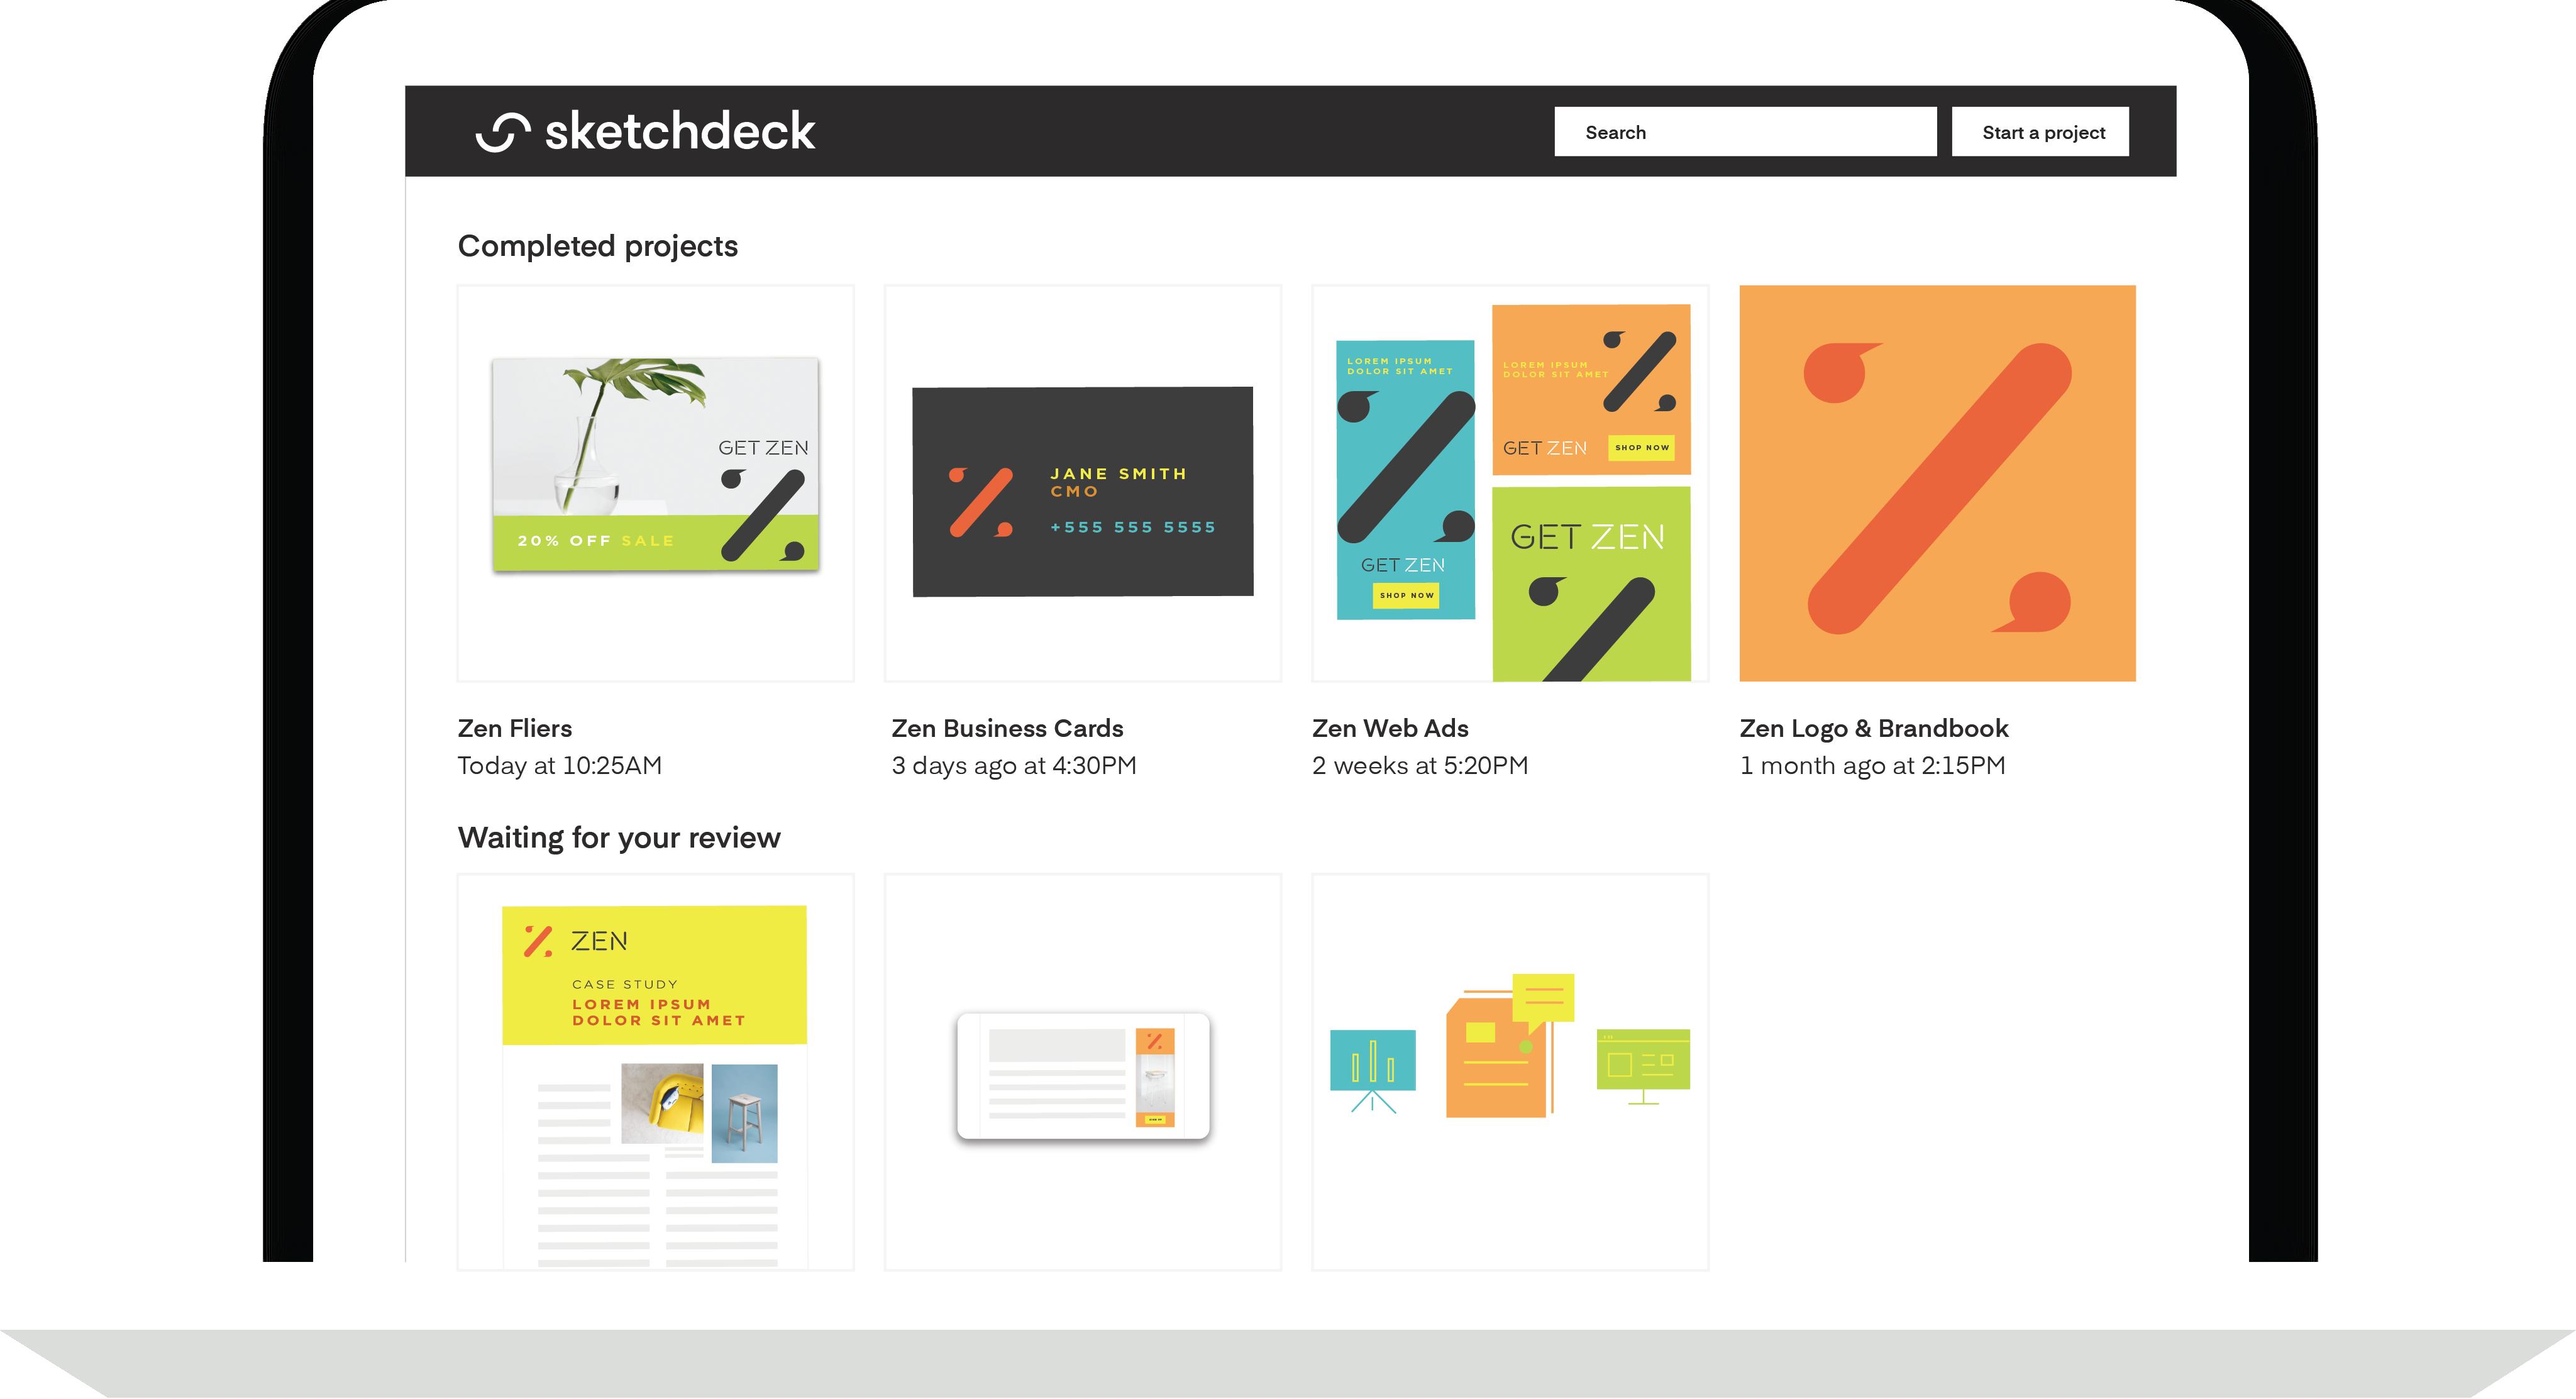 Mockup of the SketchDeck dashboard